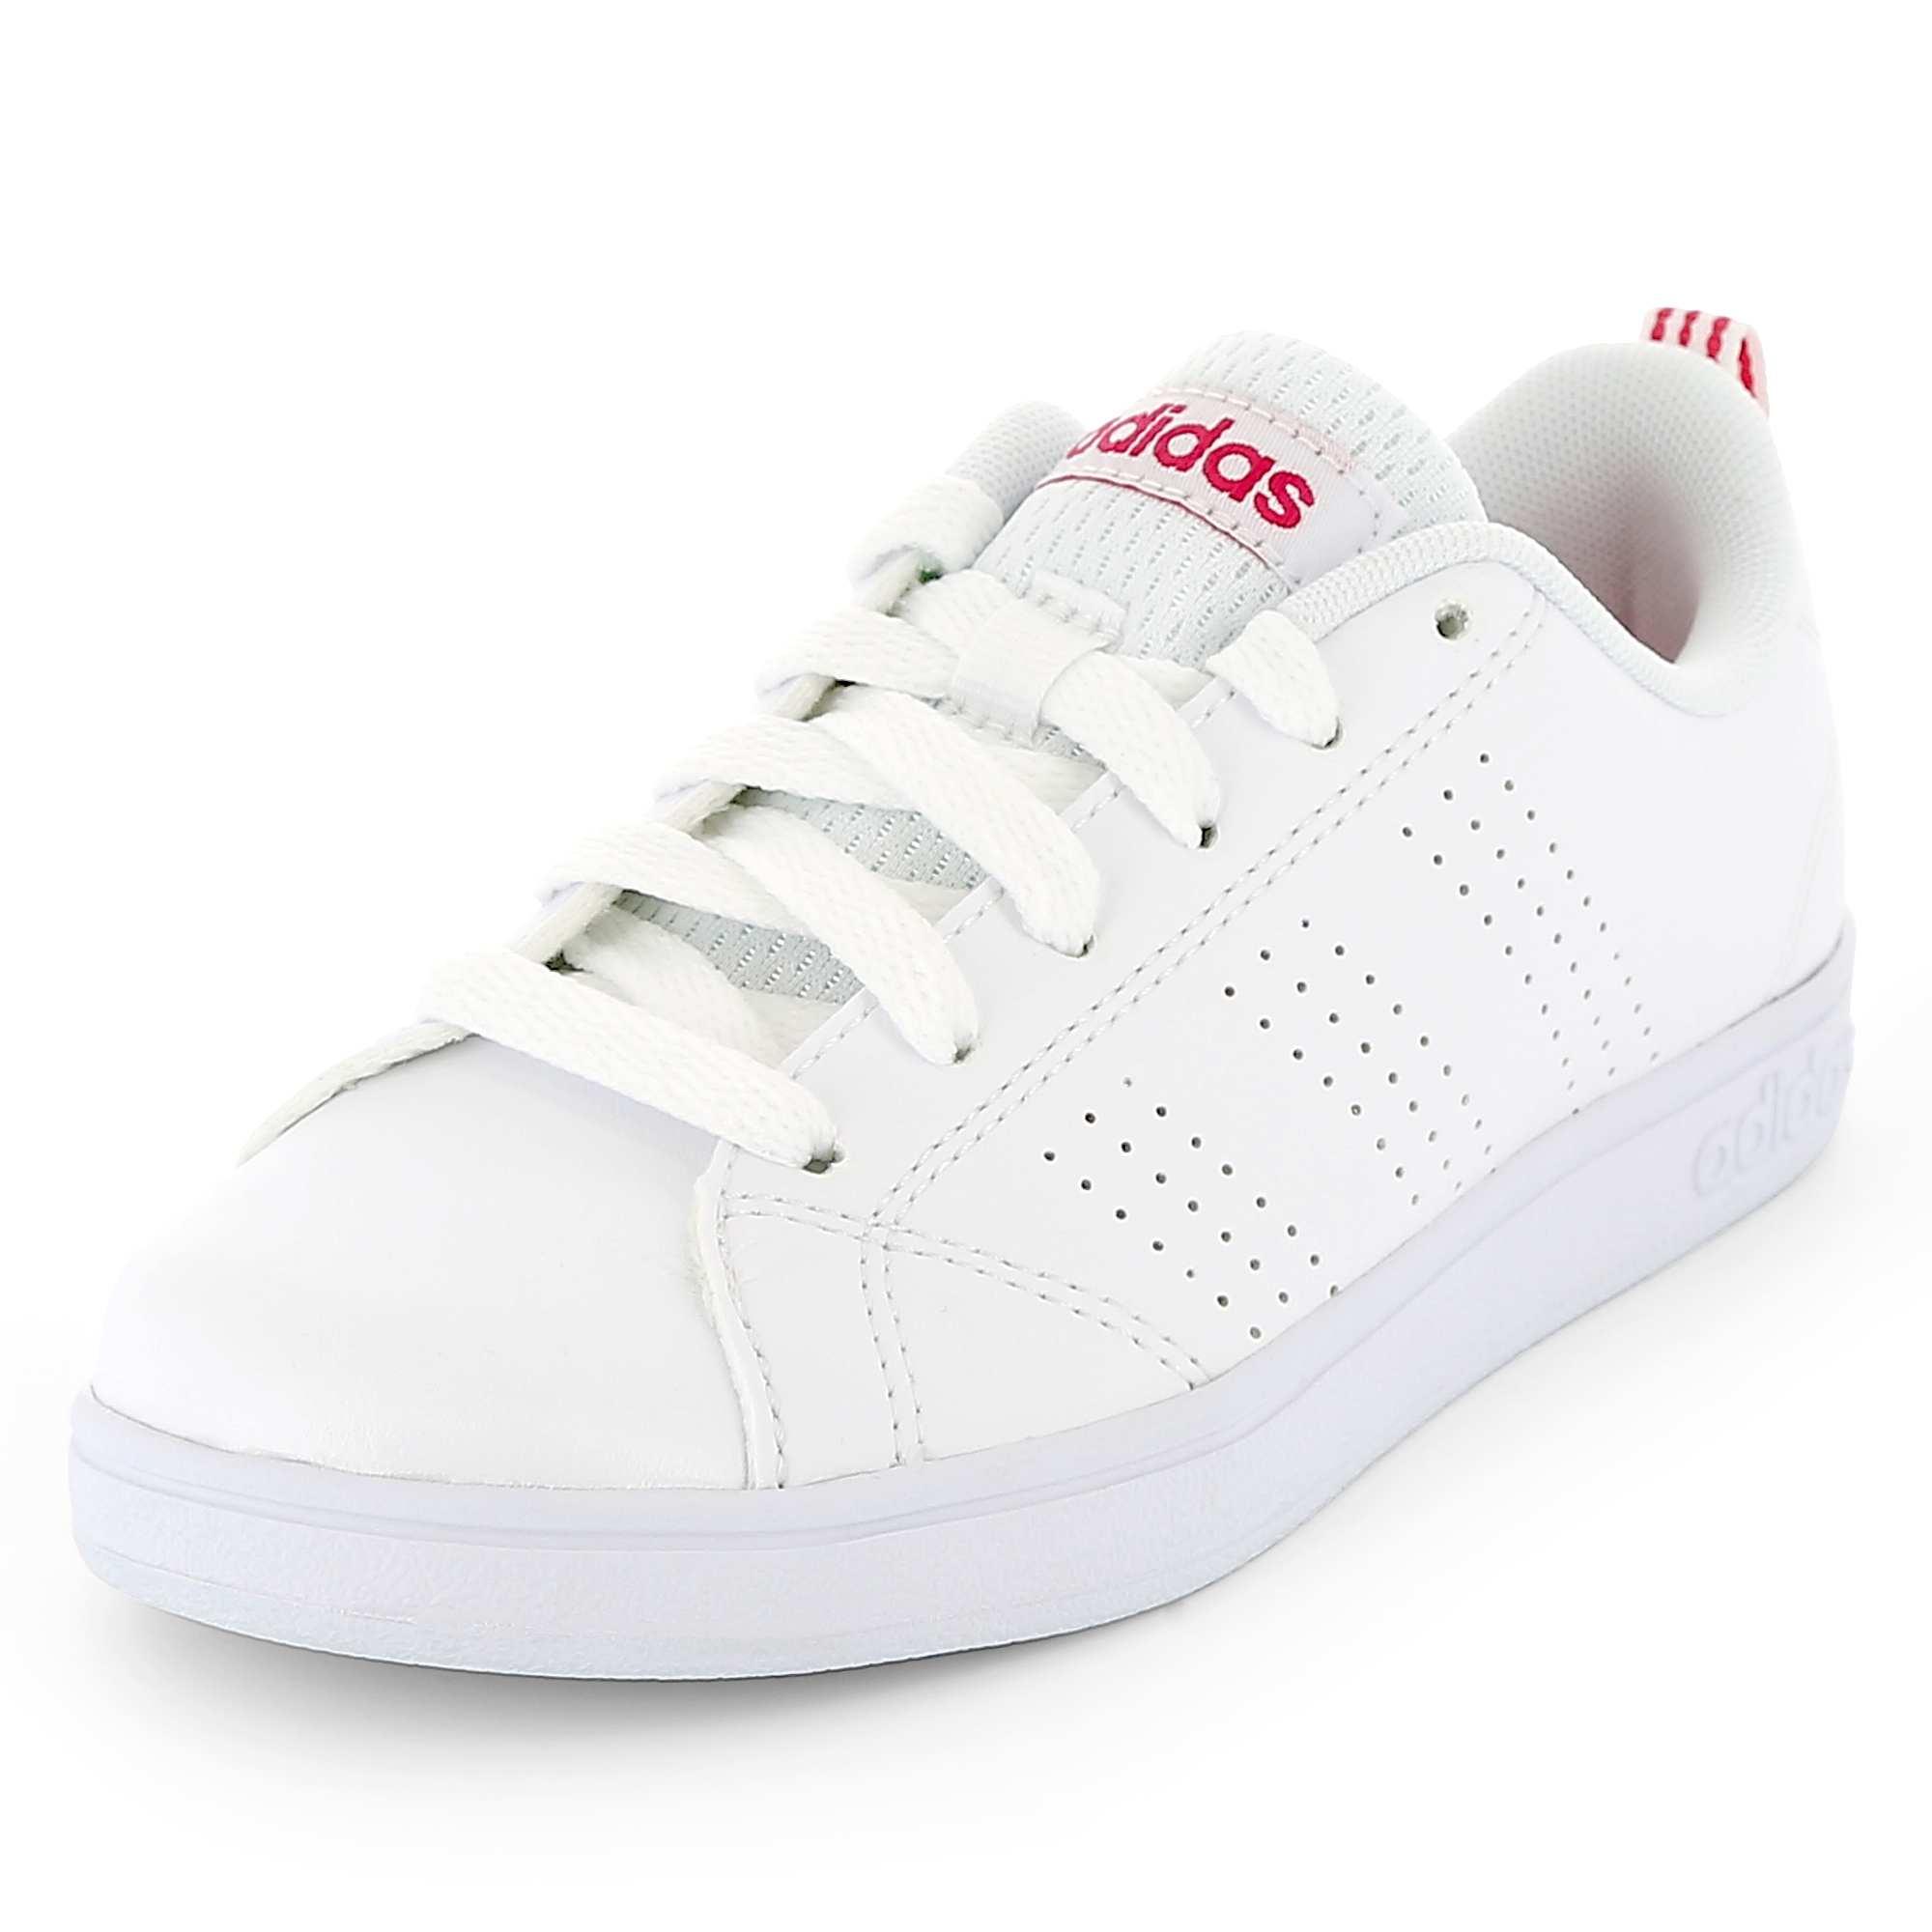 4ea644897 Ténis 'Adidas' 'VS ADVANTAGE CL K' Branco Menina 10-18 anos. Loading zoom